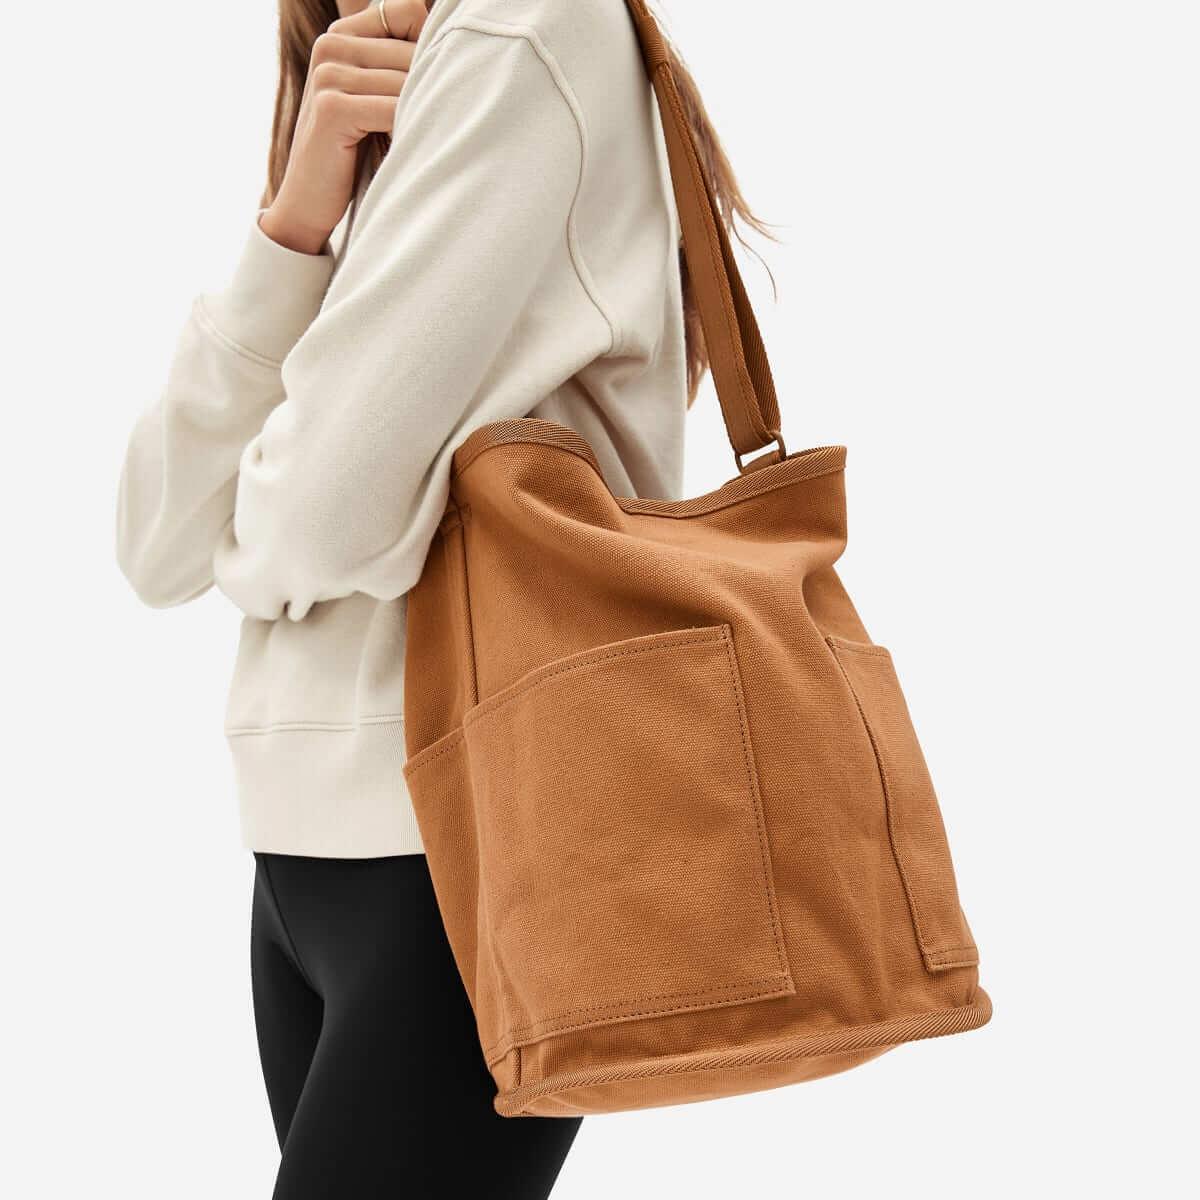 The Lantern Bag